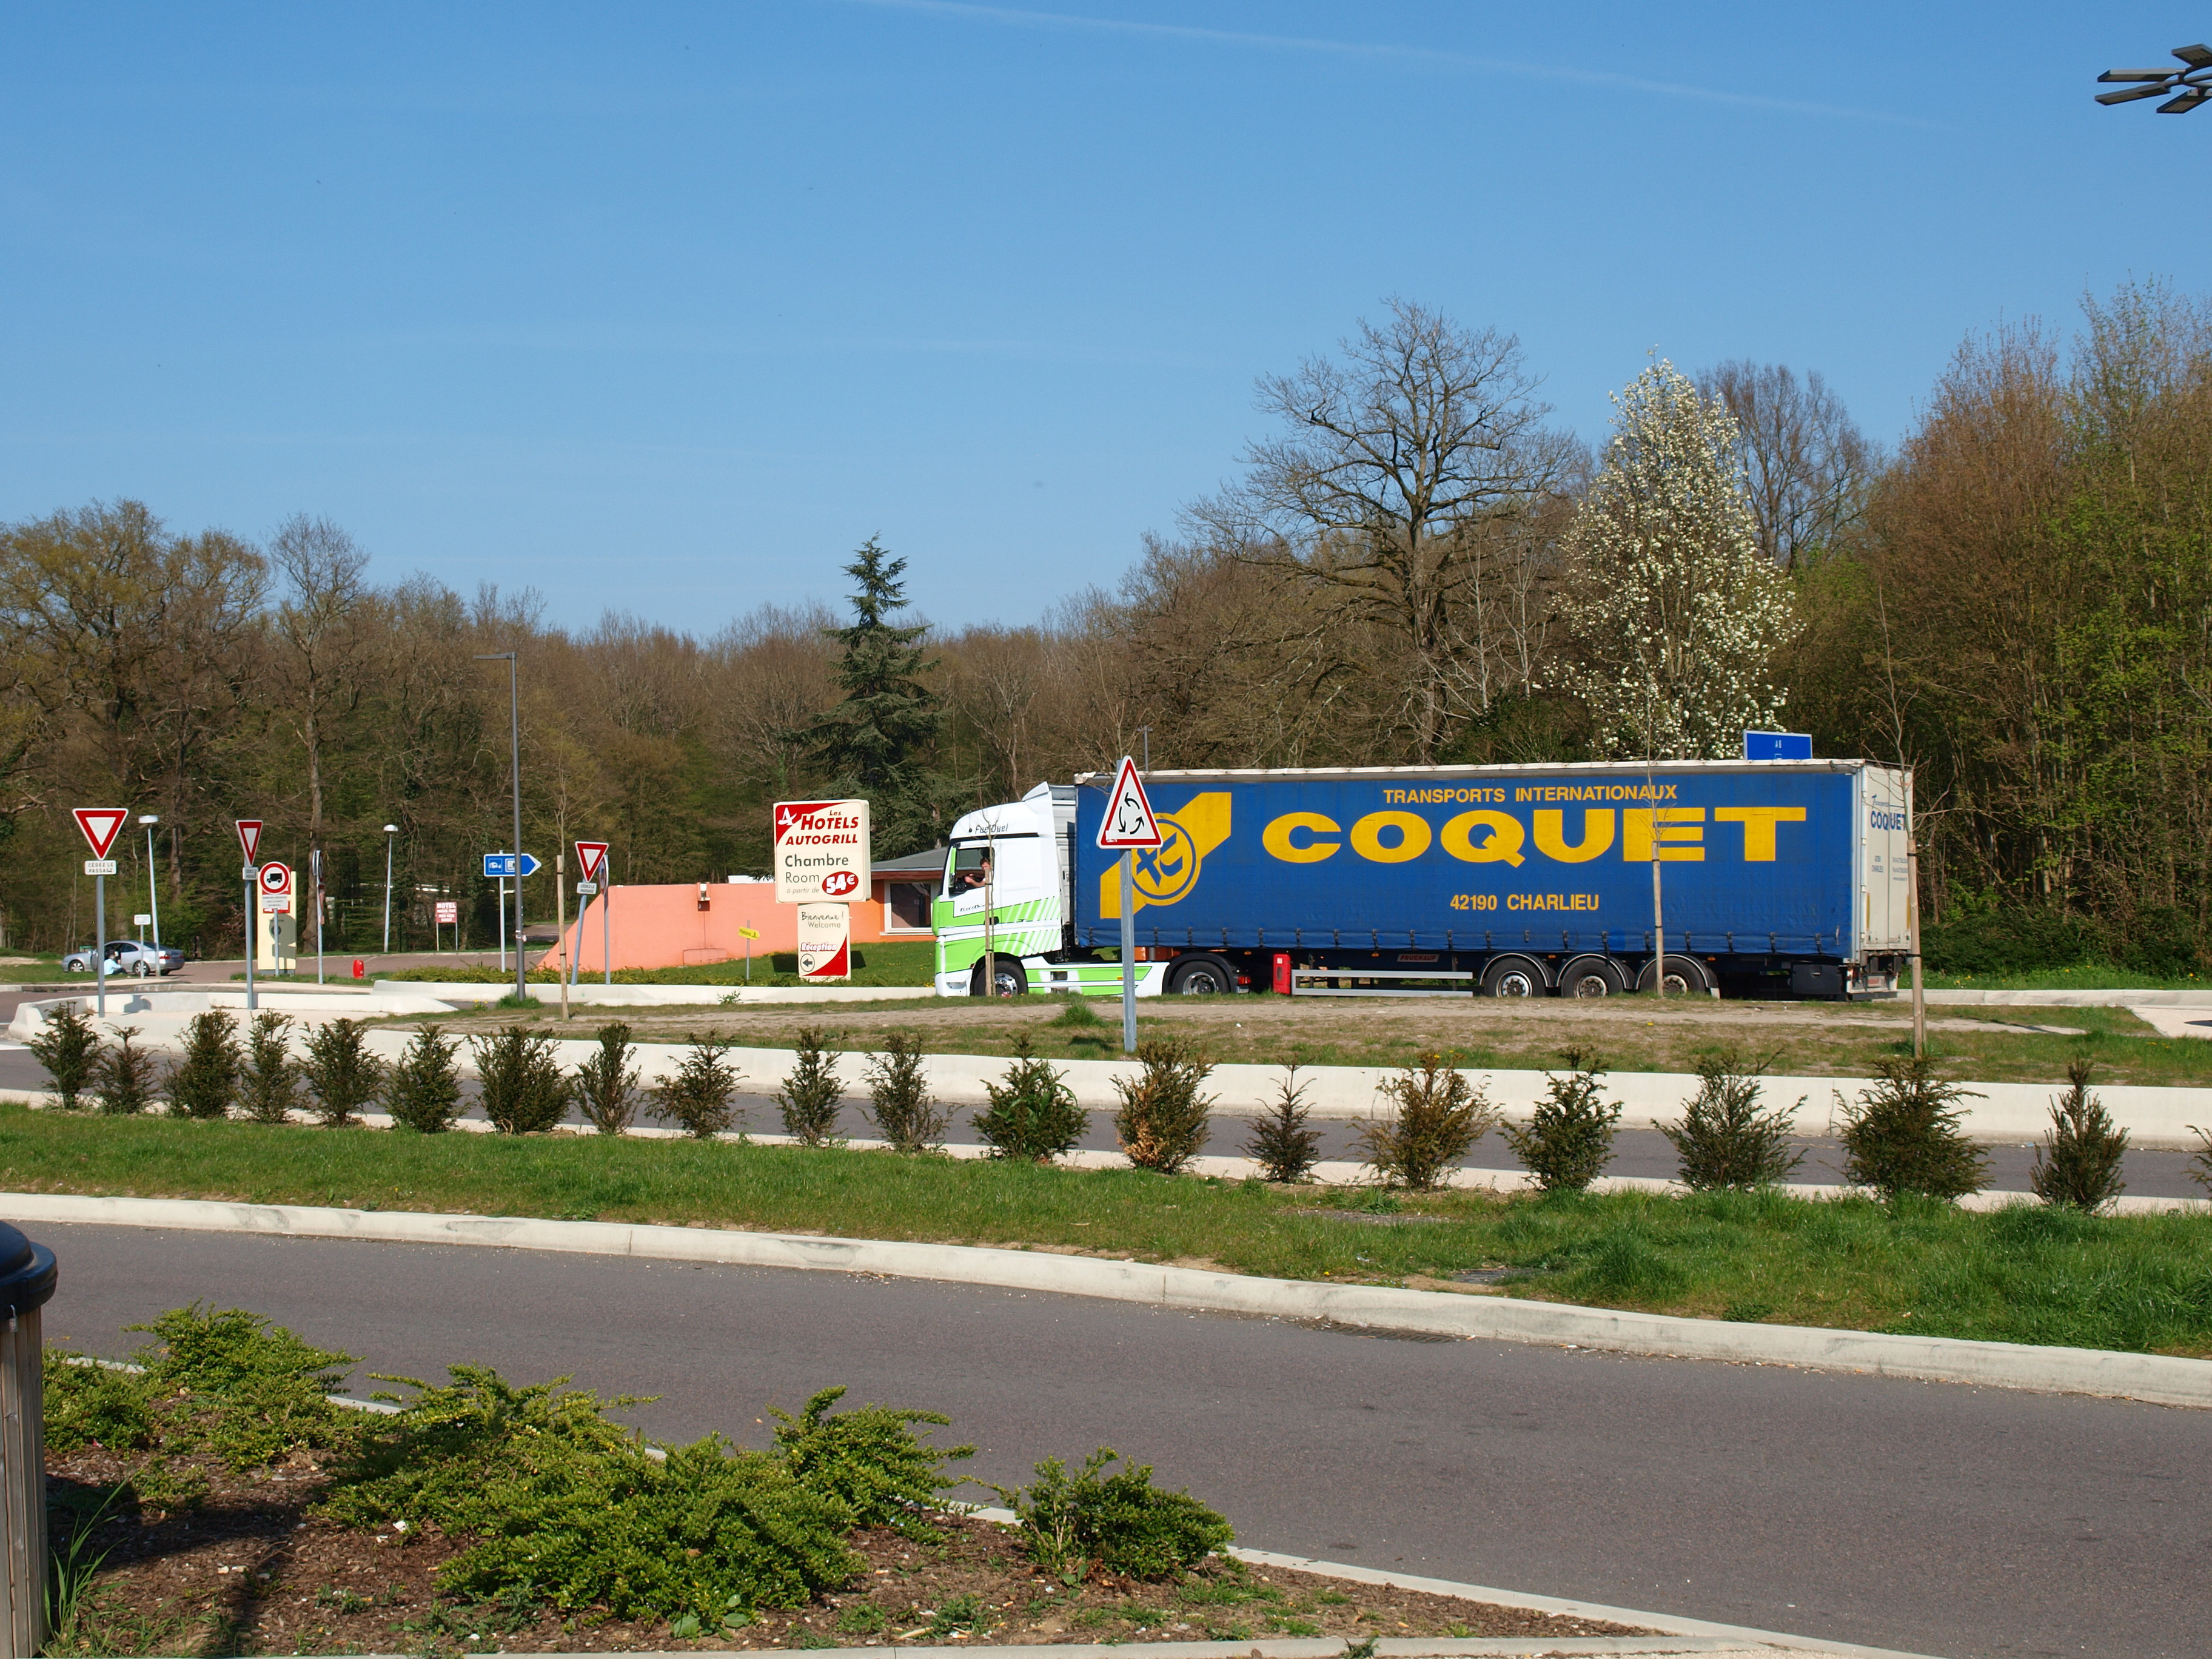 file:merceuil-fr-21-autoroute a6-aire de repos-02 - wikimedia